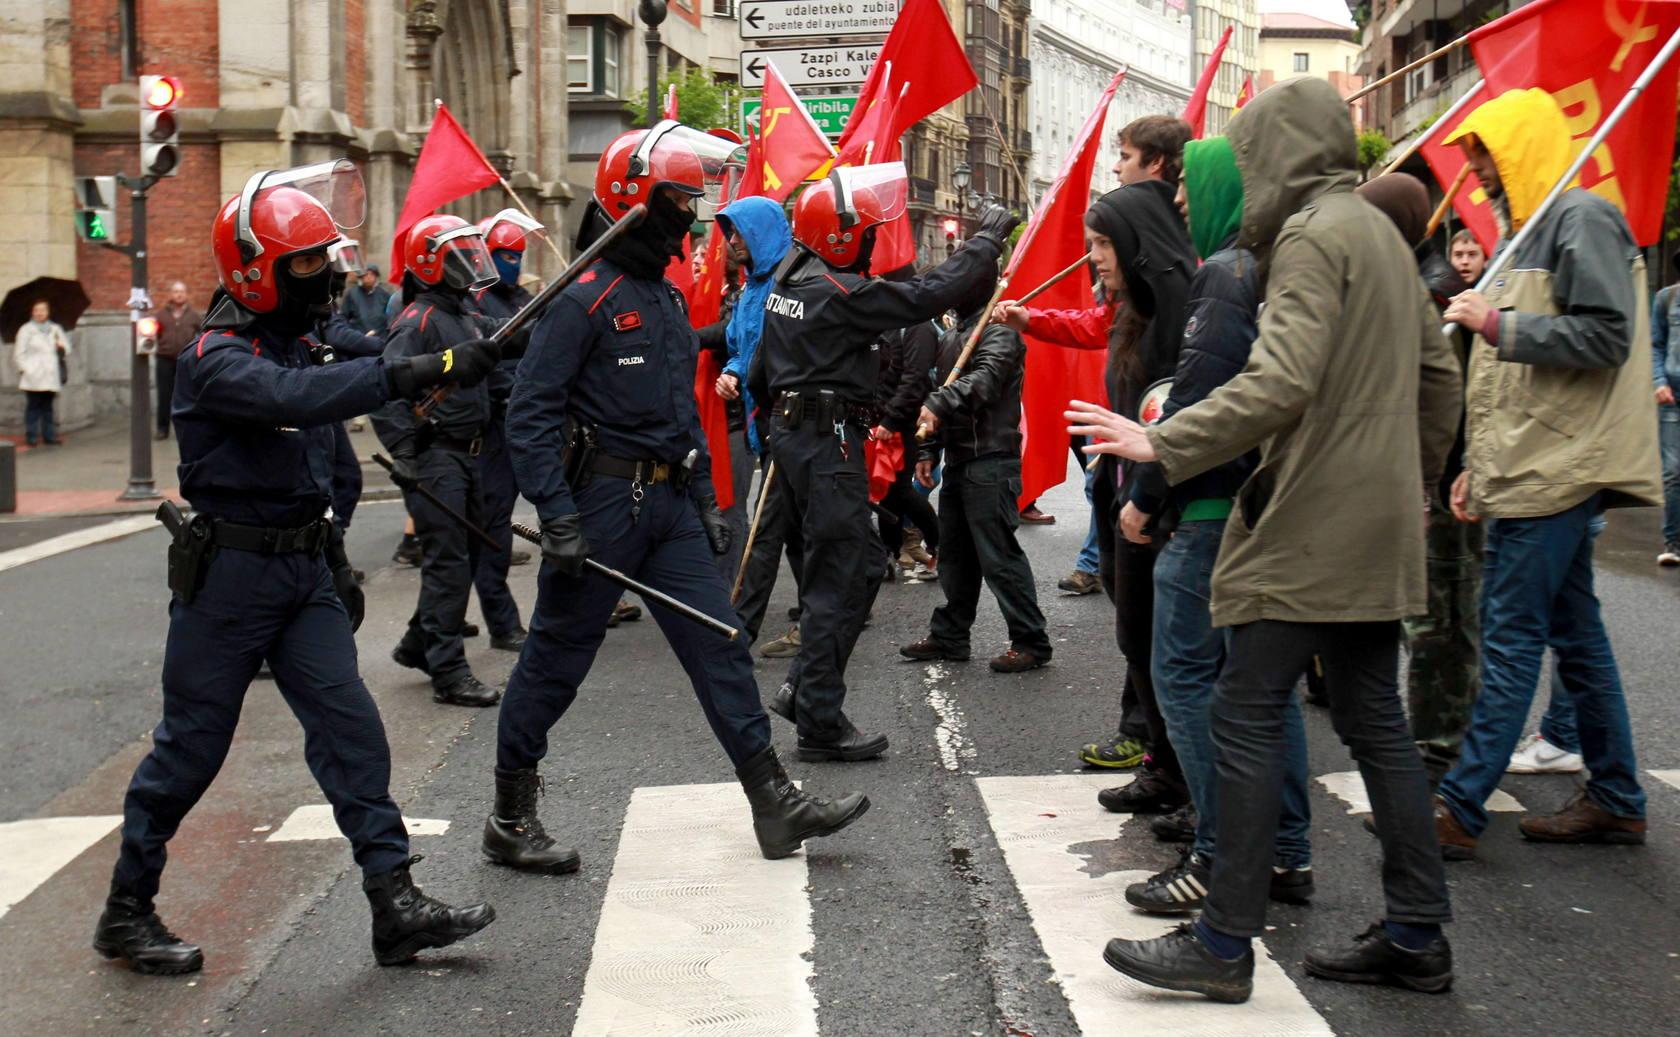 Octava huelga en Euskadi desde que empezó la crisis. Las fotos de Vitoria